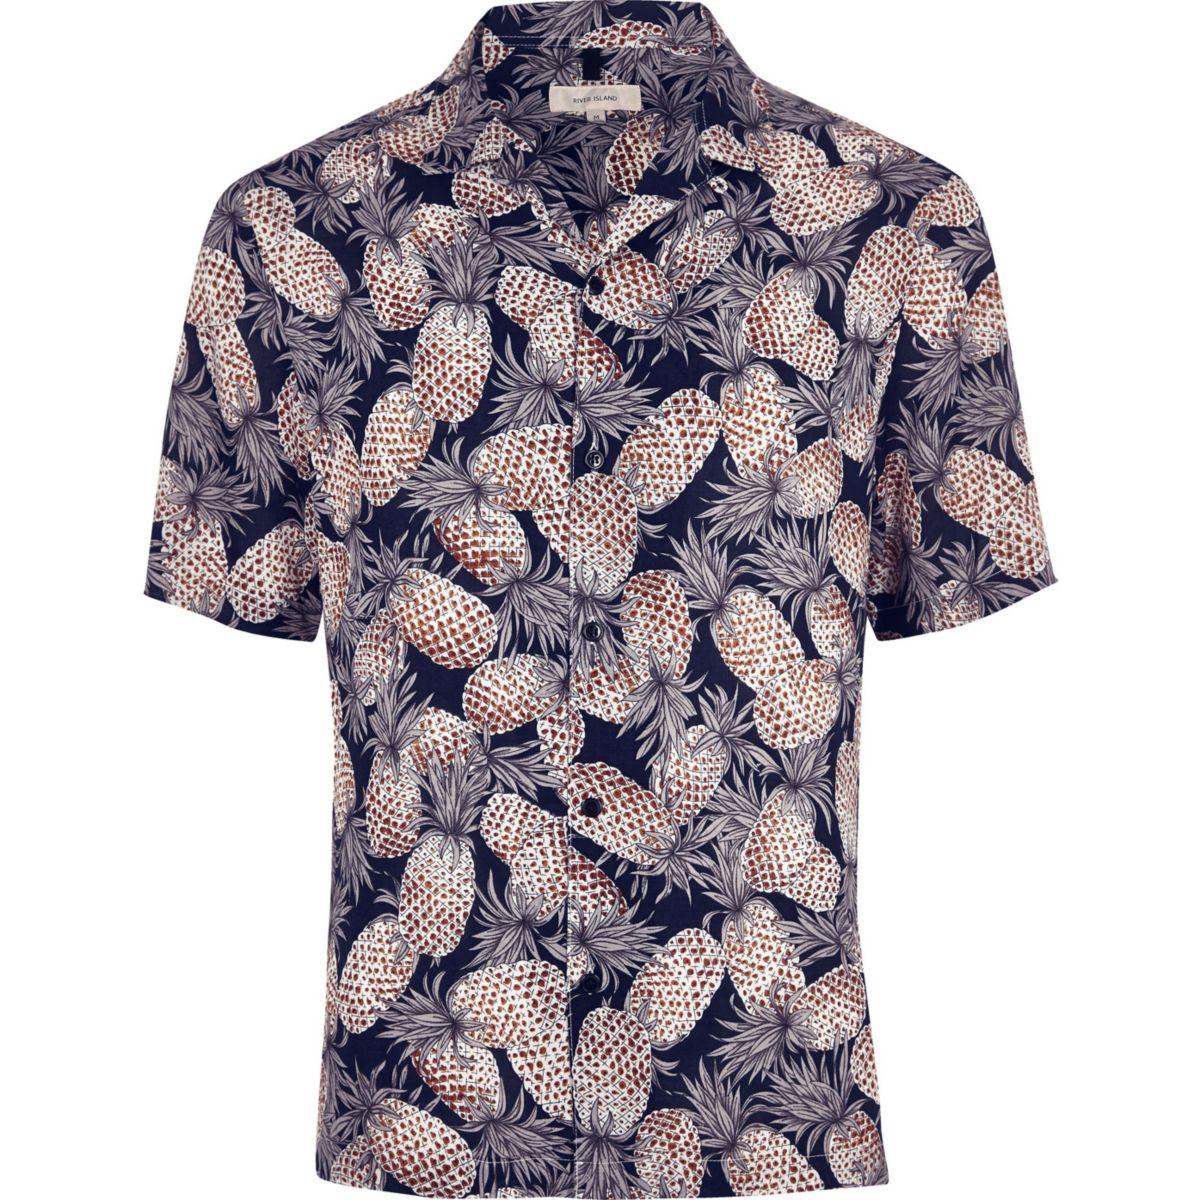 Big and Tall navy print short sleeve shirt